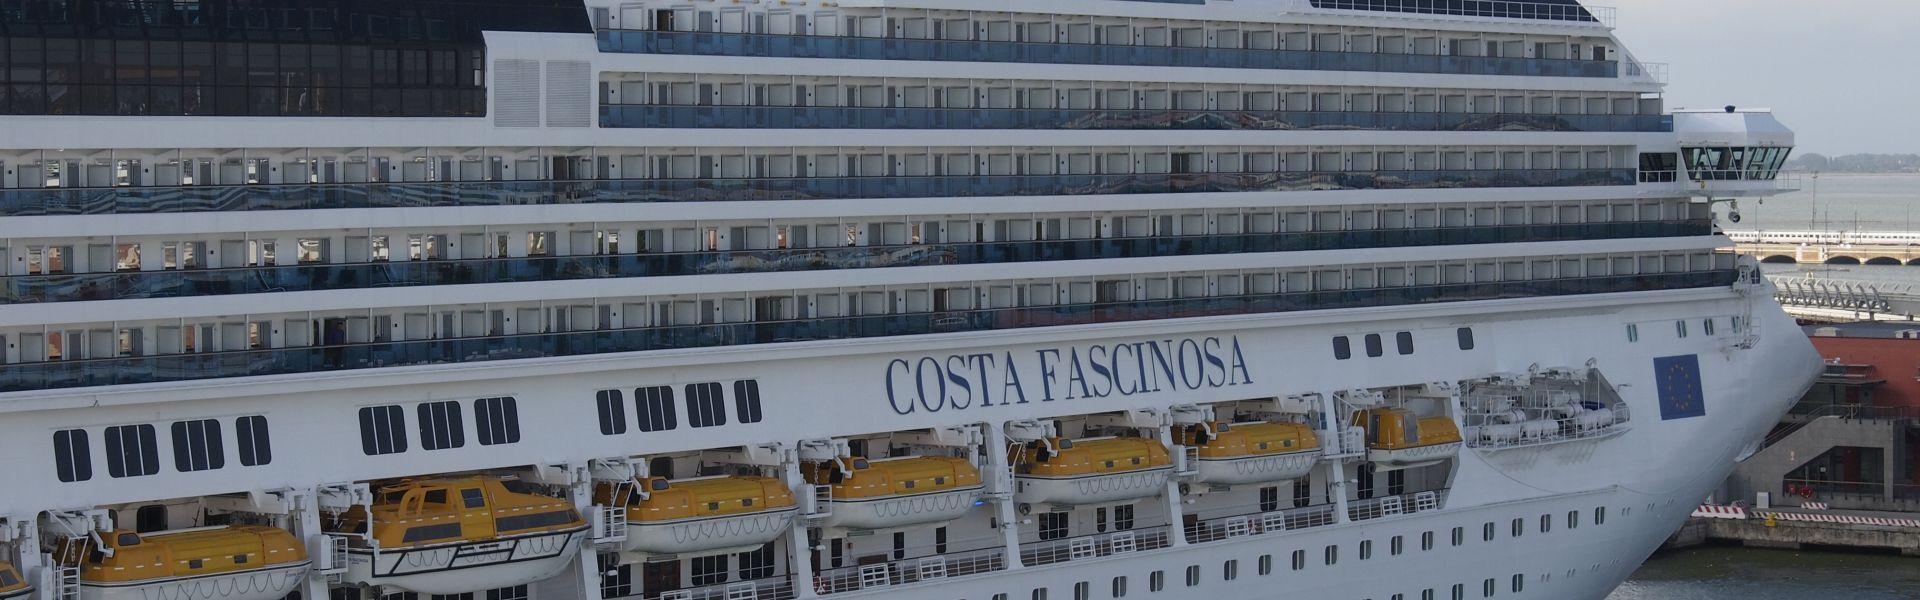 Croaziera 2018 - Mediterana de Vest (Savona) - Costa Cruises - Costa Fascinosa - 7 nopti